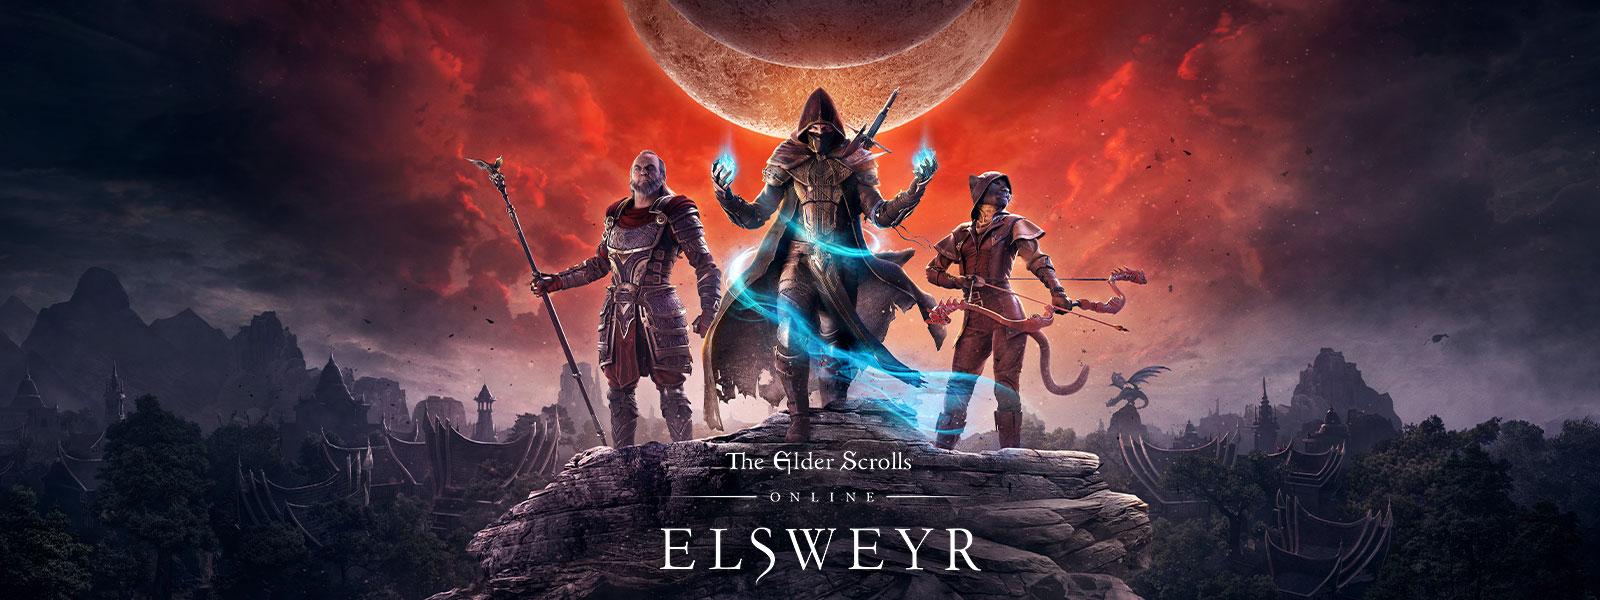 The Elder Scrolls Online: Elsweyr 標誌,在兩個月亮和紅色光線下,三個角色站在岩石頂端擺姿勢